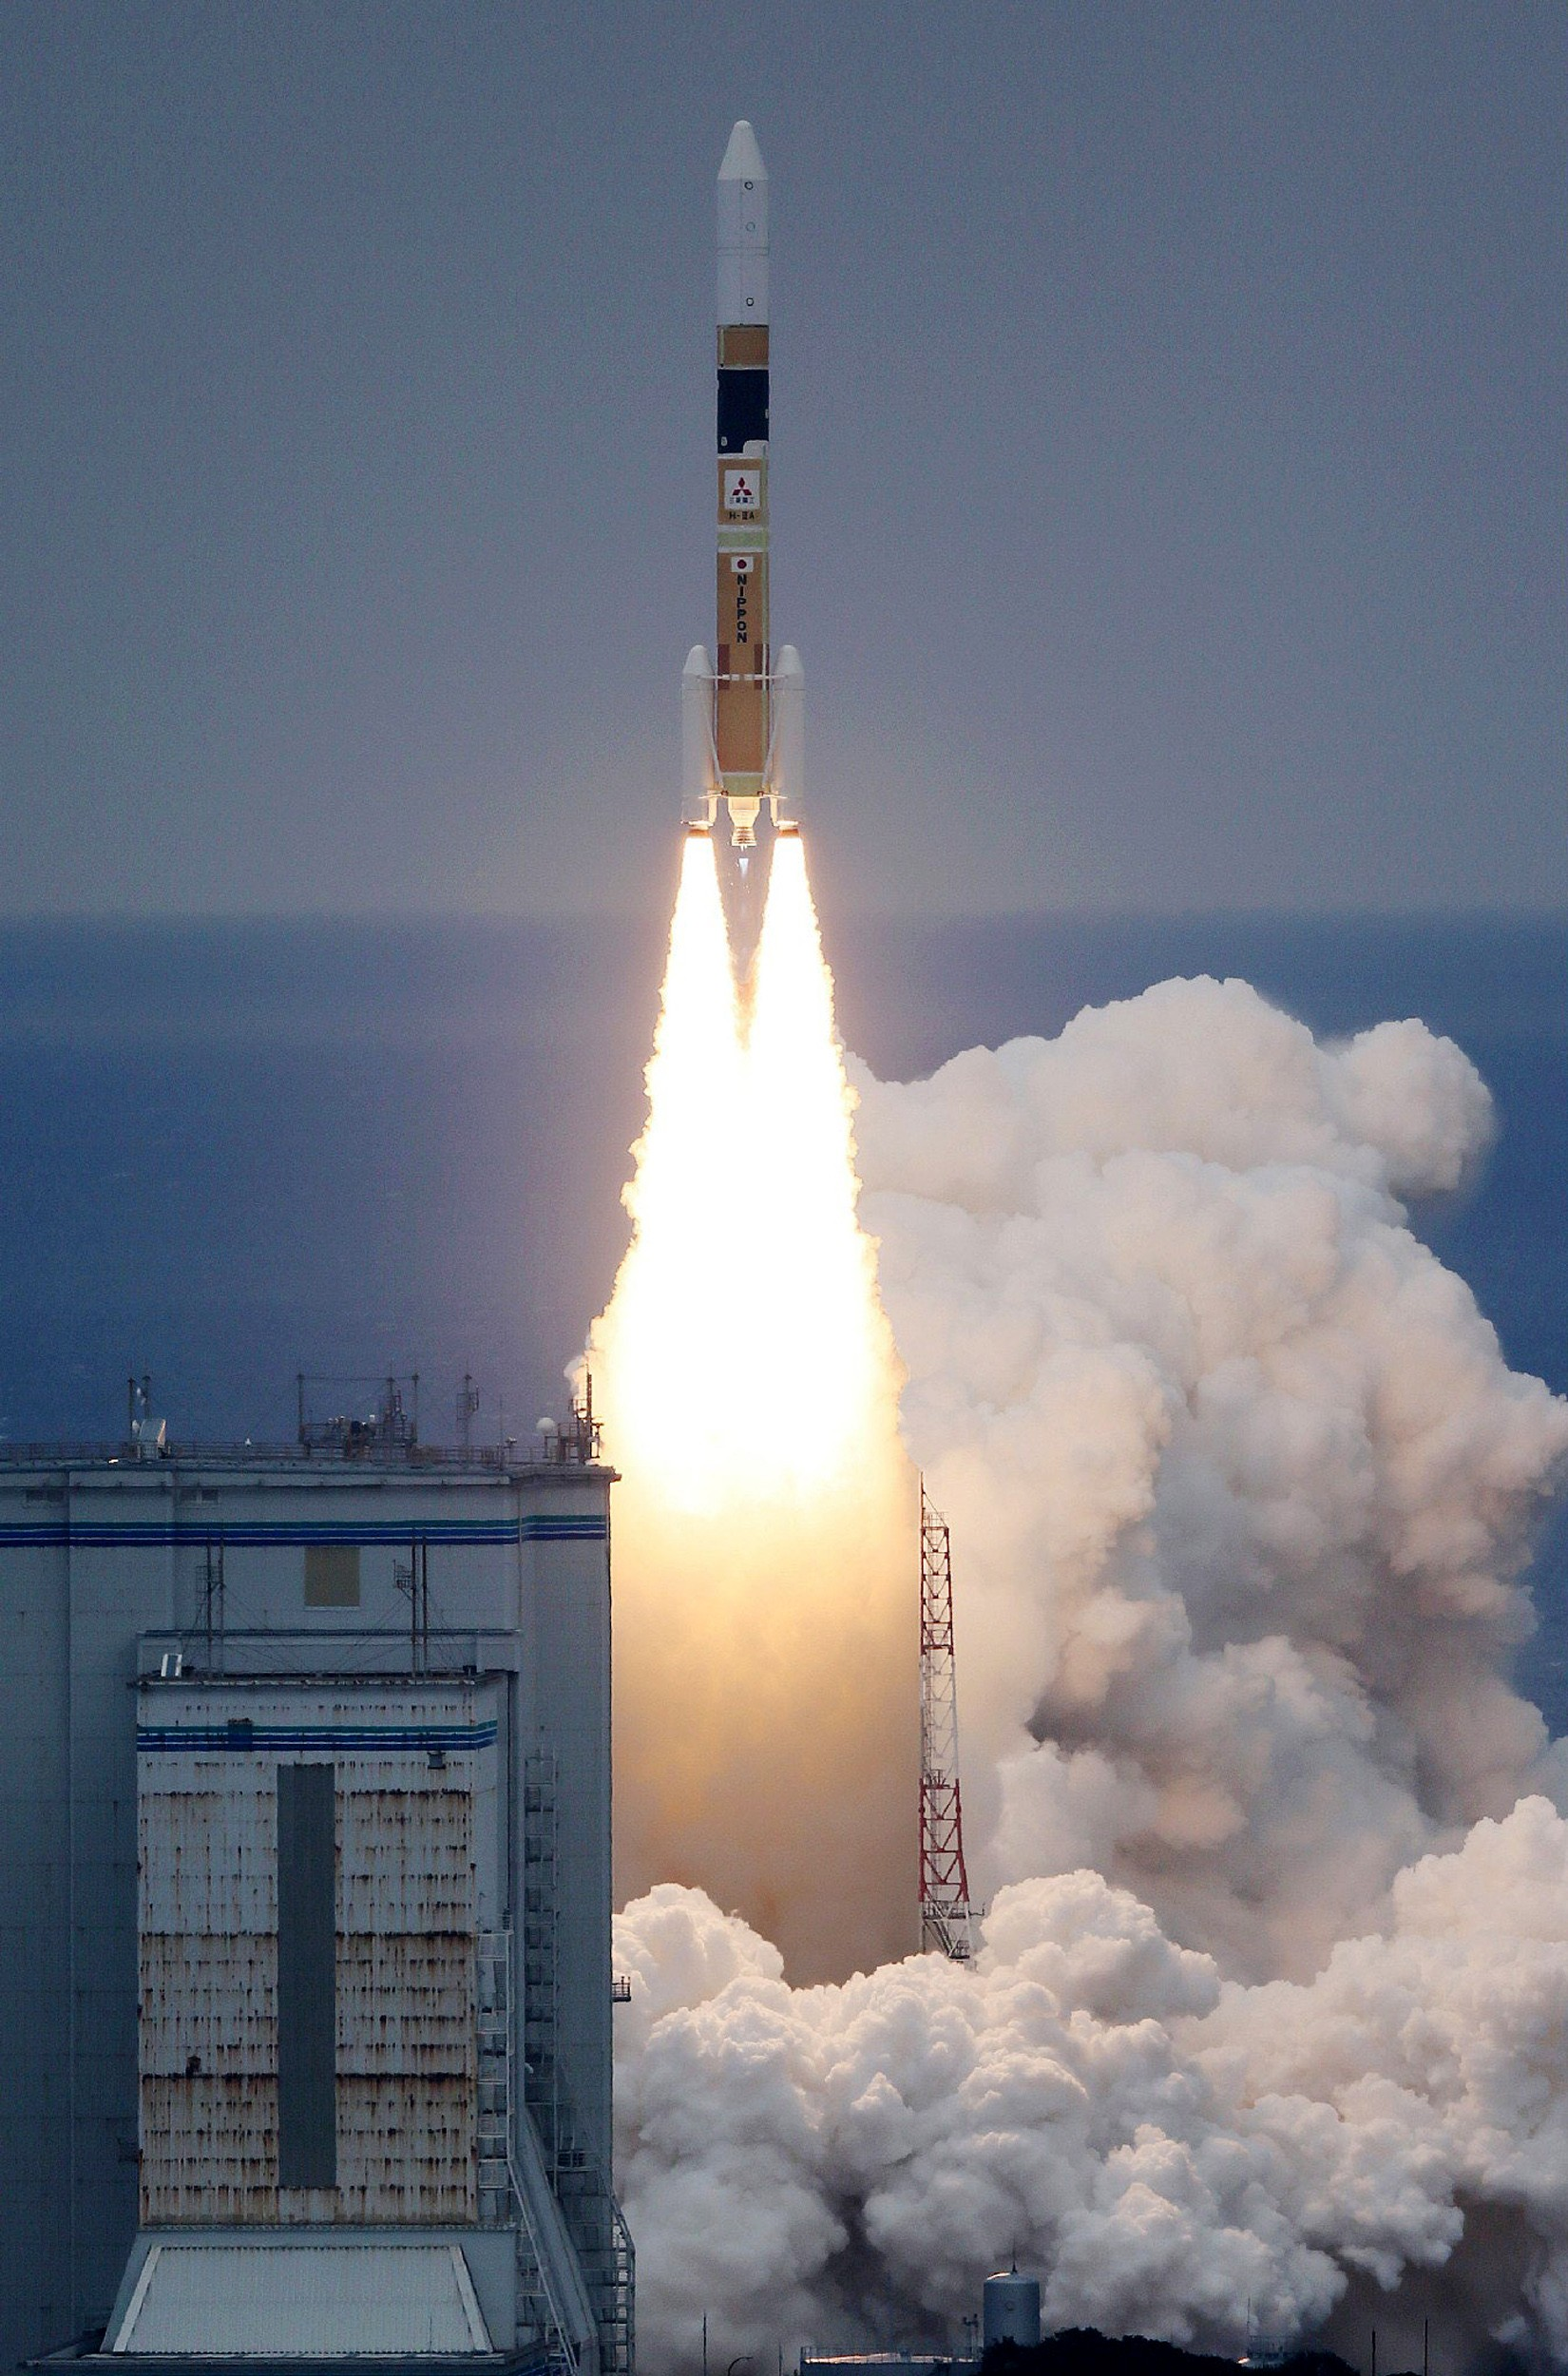 Foguete japonês é lançado com dois satélites (Foto: JIJI PRESS / AFP)